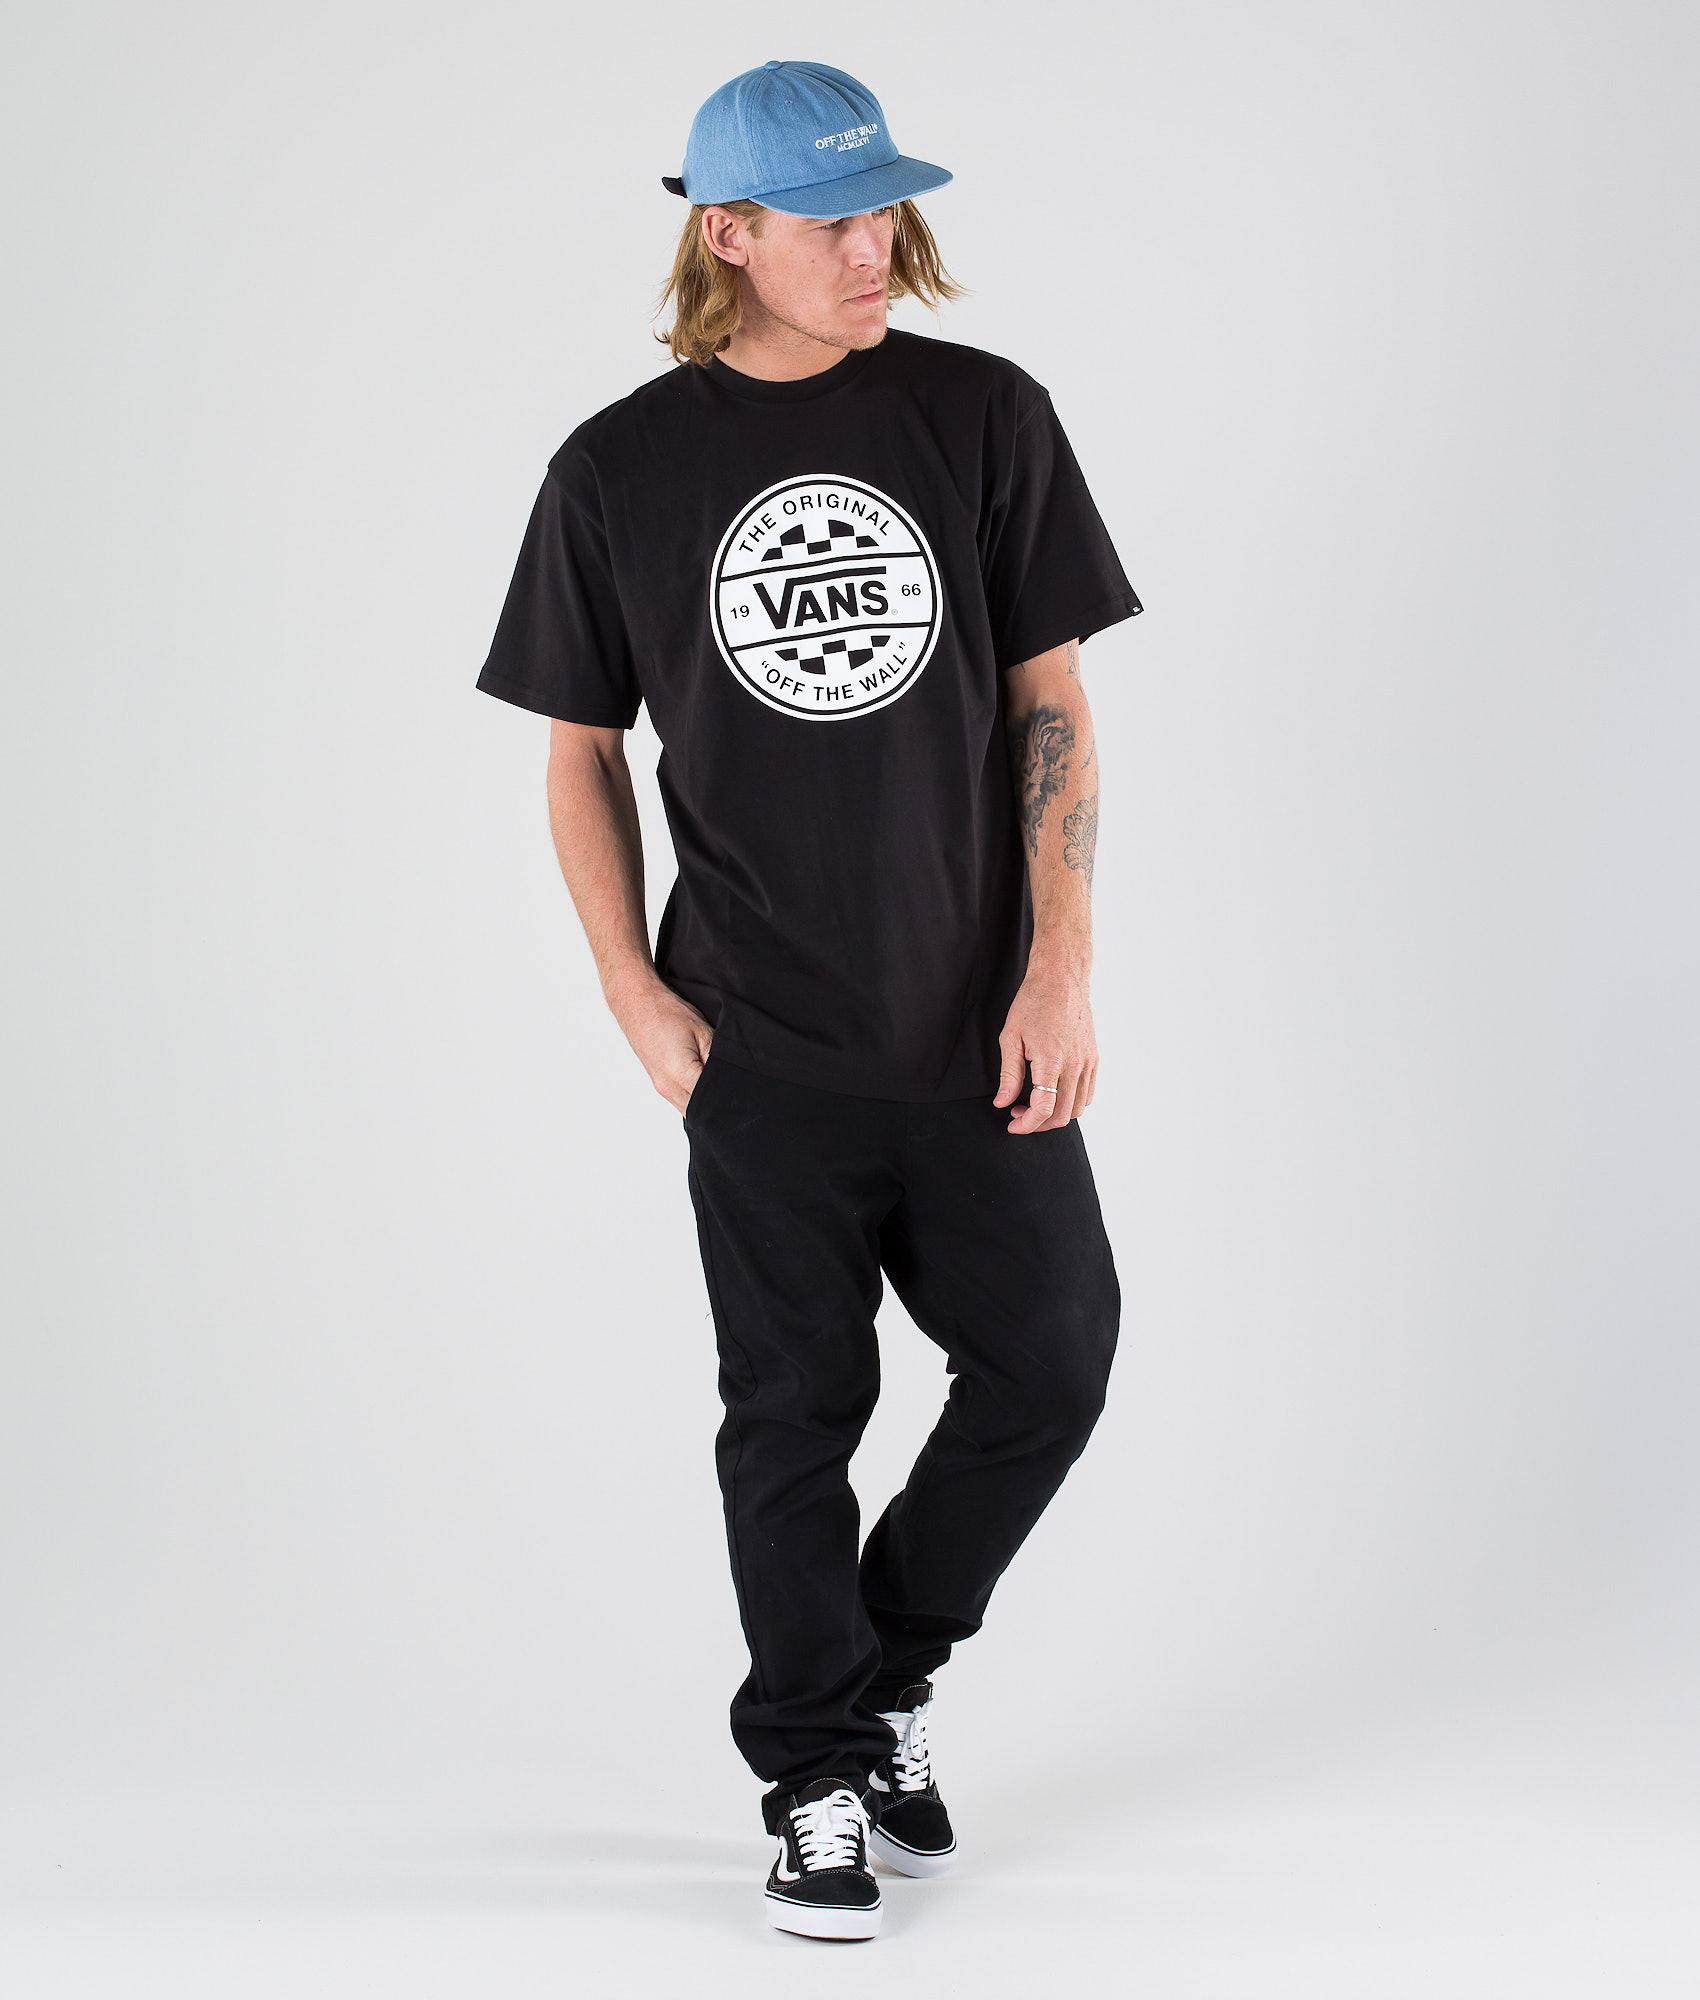 094738d407c Vans Checker Co. II T-shirt Black White - Ridestore.com